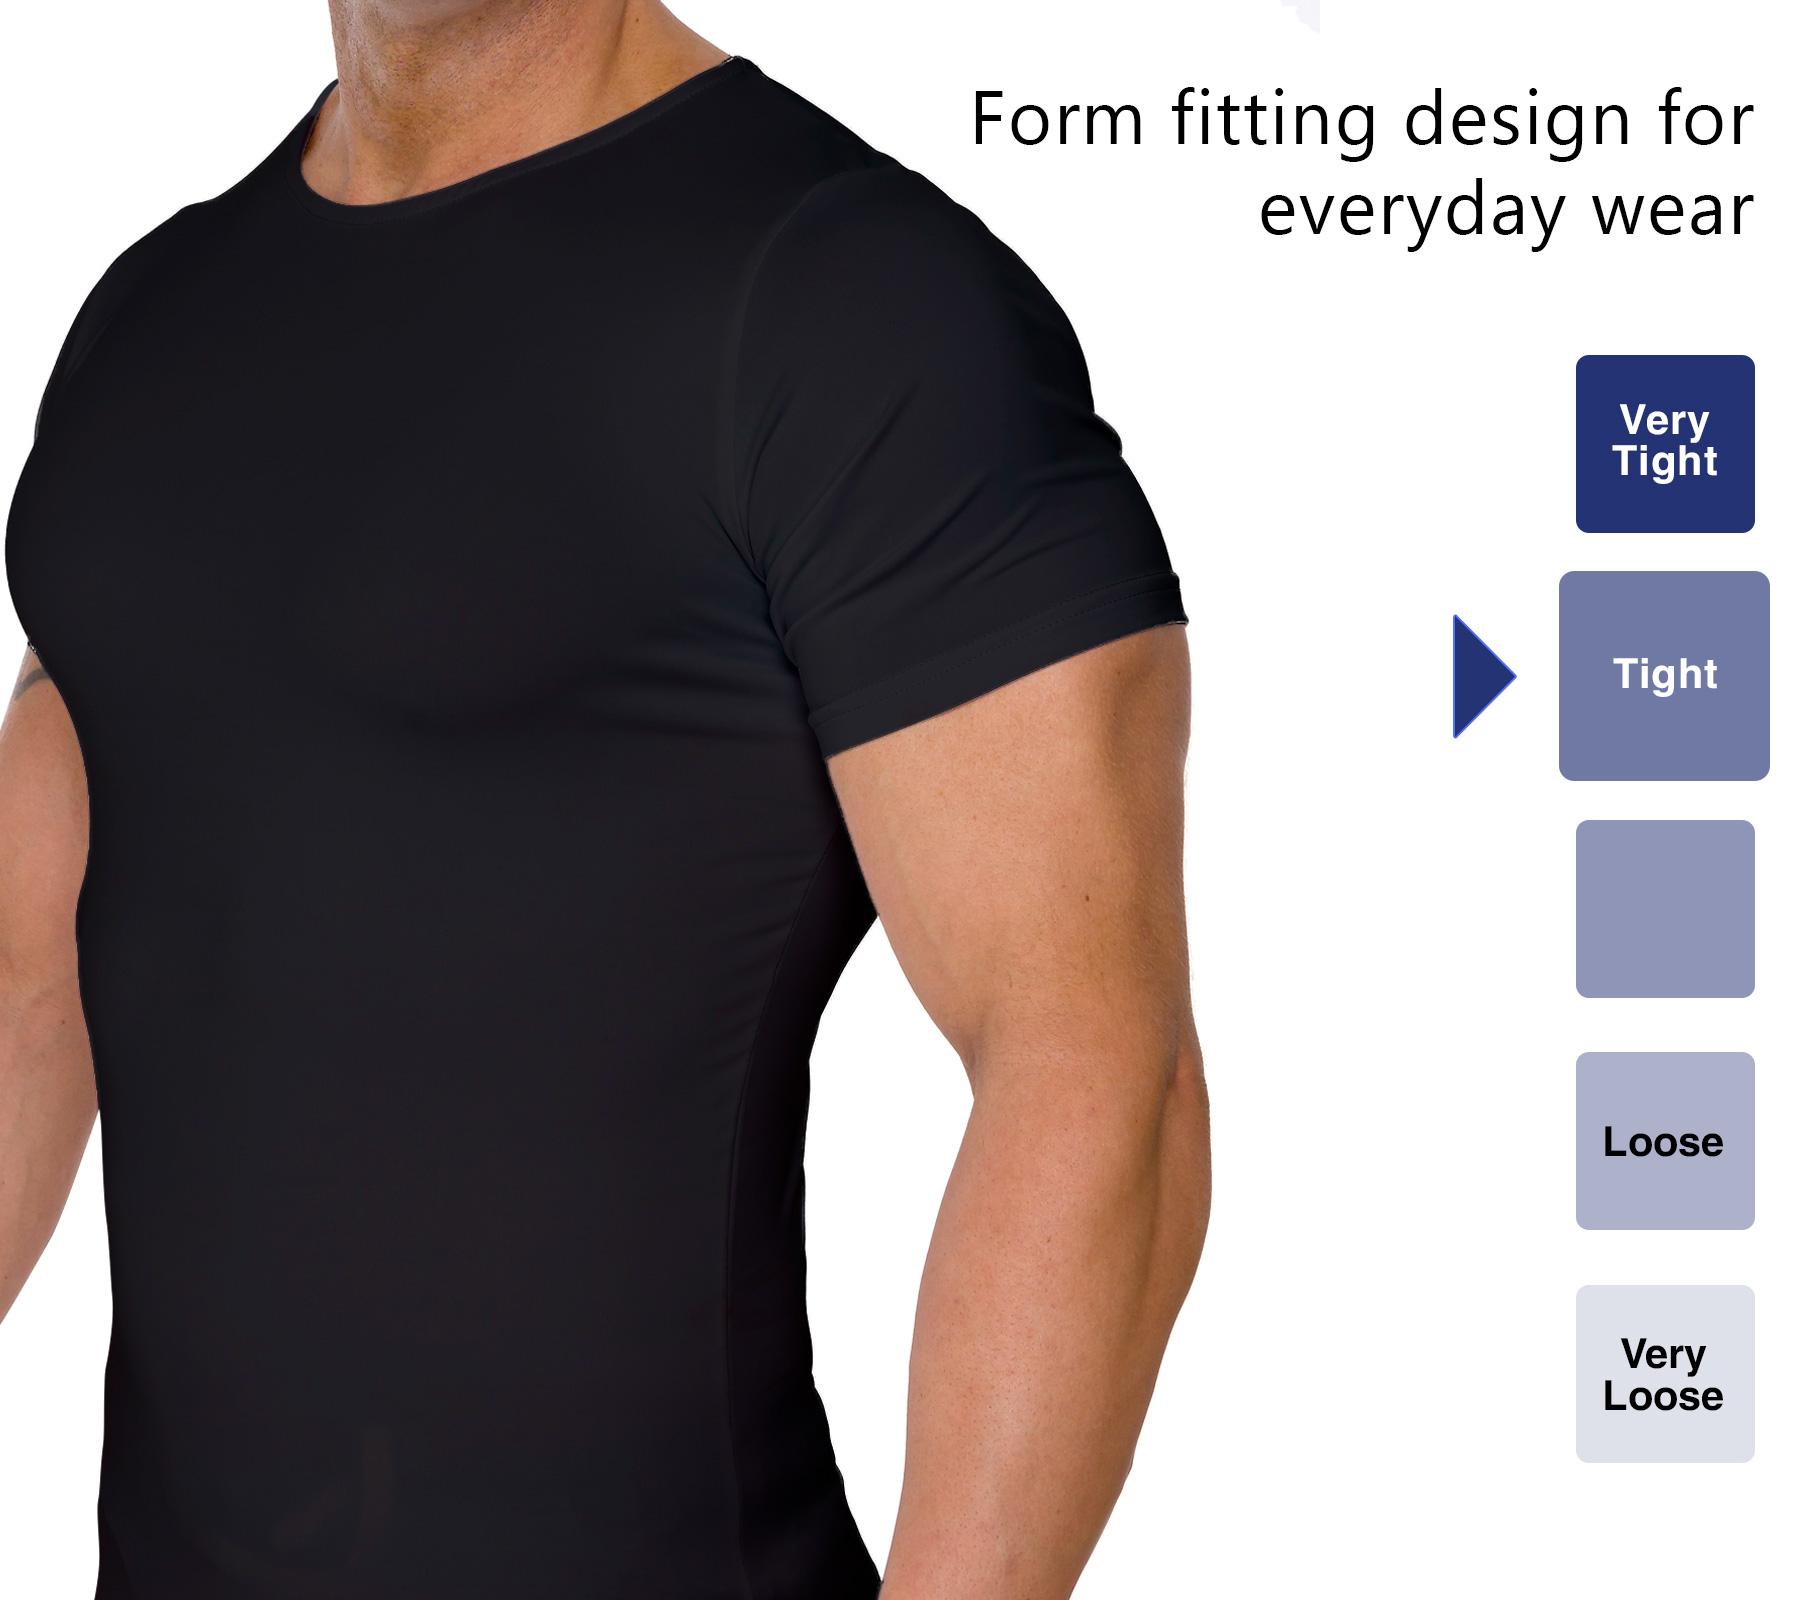 LISH-Men-039-s-Slimming-Compression-Body-Shaper-Gynecomastia-Undershirt thumbnail 9